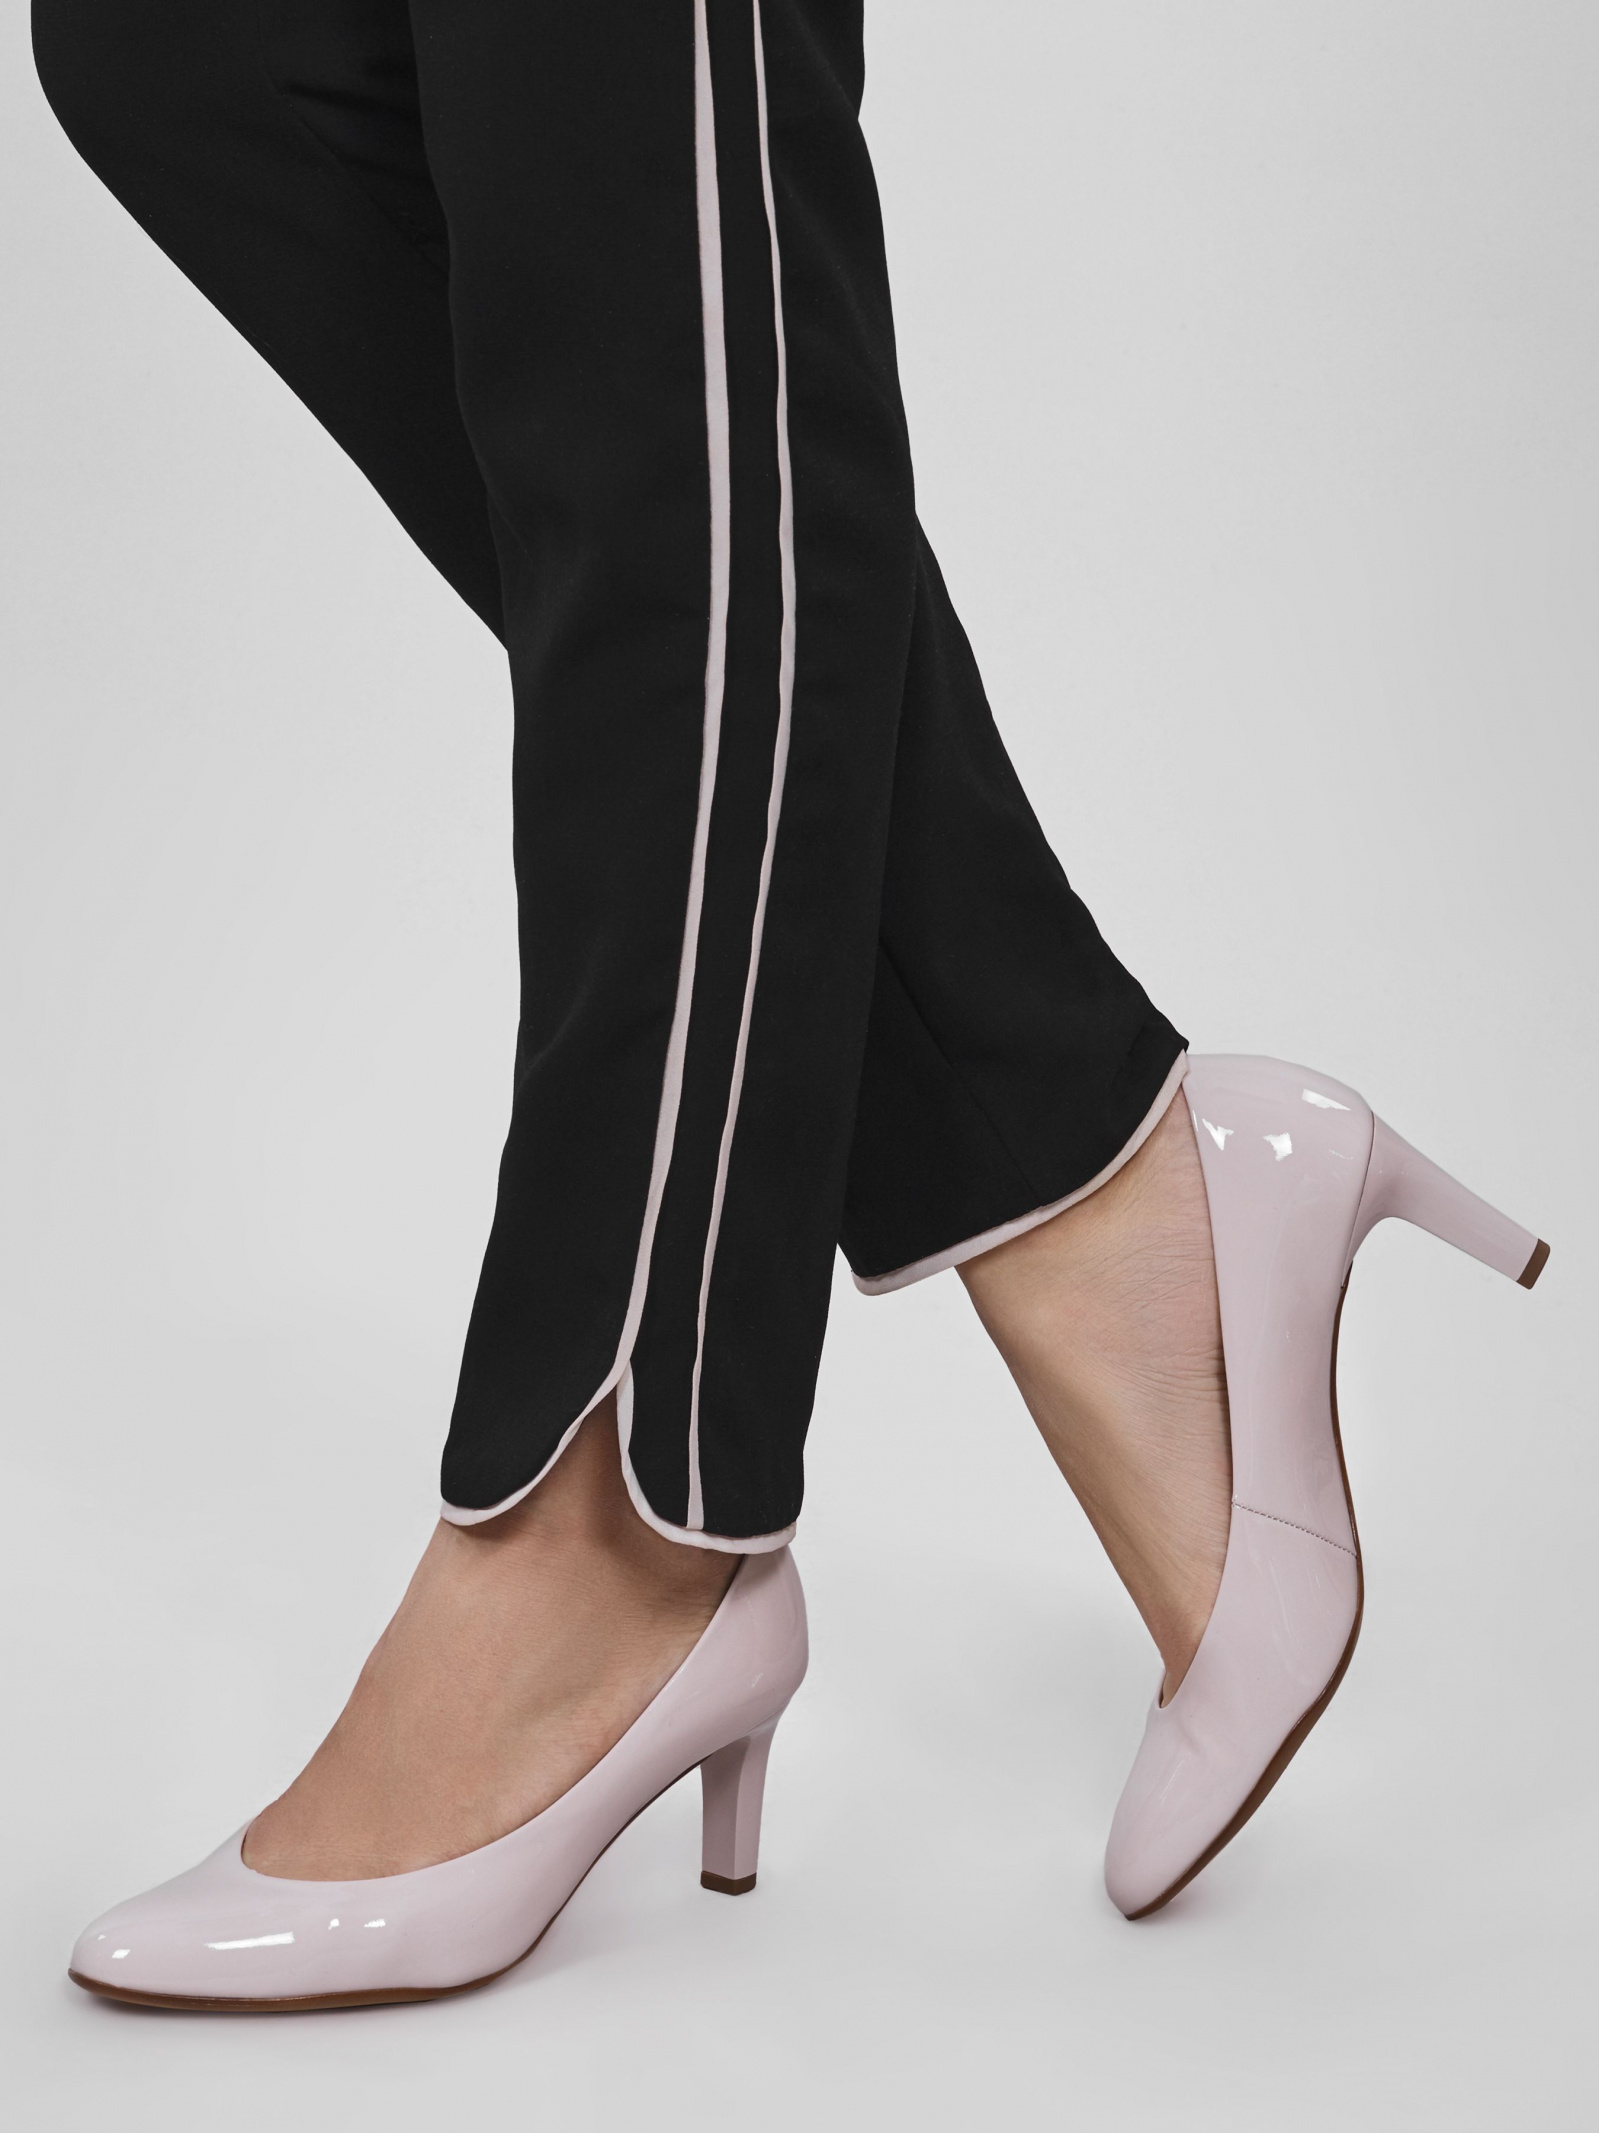 Туфли для женщин Hogl STARLIGHT YN4021 брендовая обувь, 2017